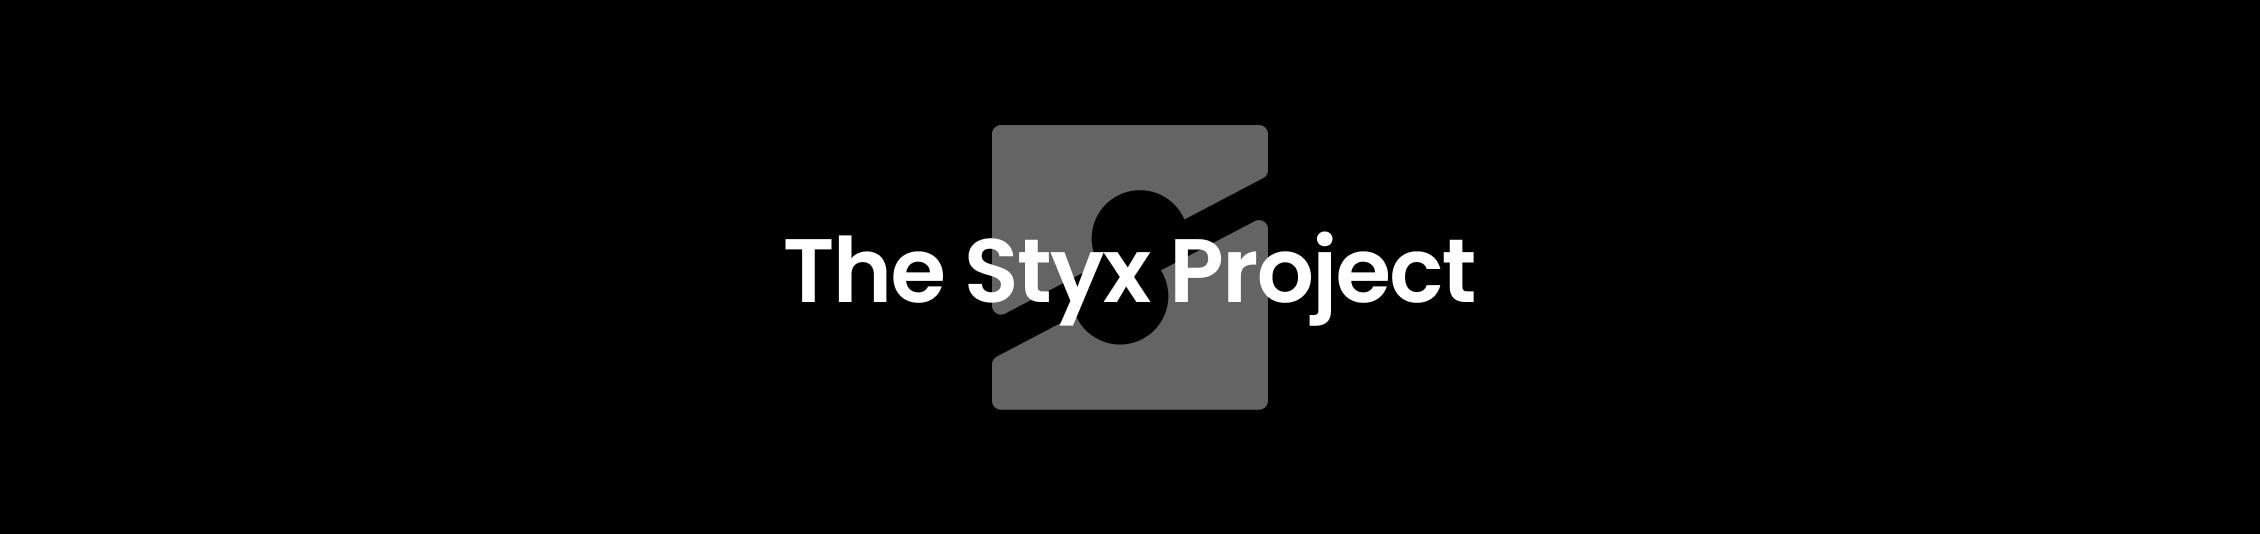 https://raw.githubusercontent.com/StyxProject/stuff/master/art/header.png